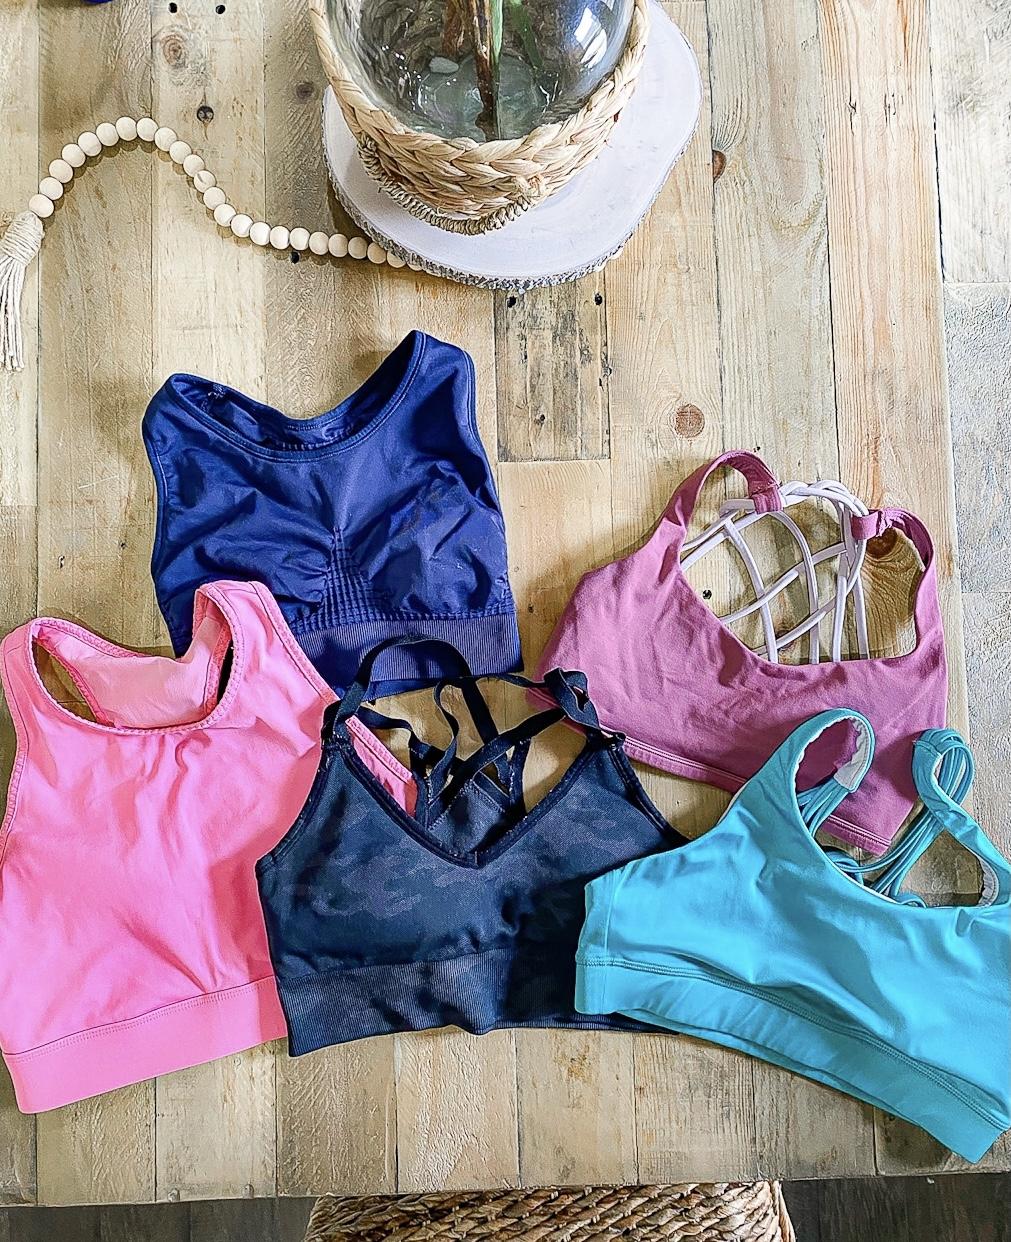 Best sports bras on Amazon